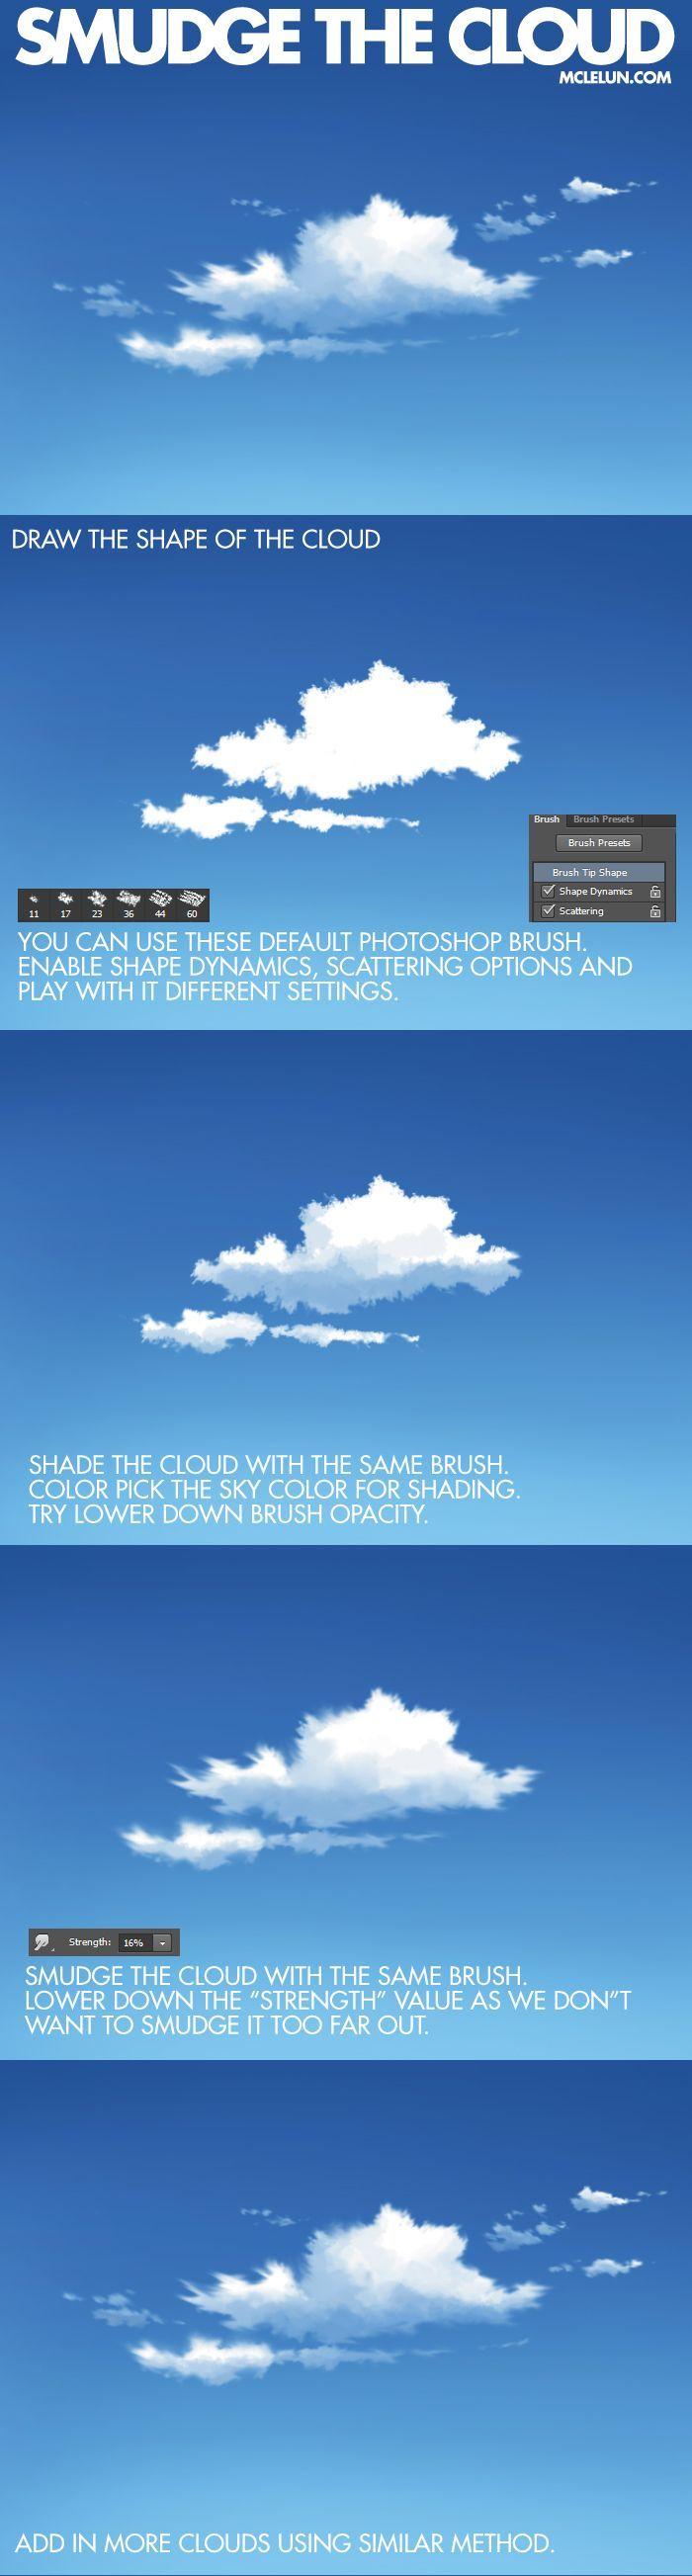 Photoshop Brush Settings For Anime Cloud Painting Digital Painting Digital Painting Tutorials Digital Art Tutorial